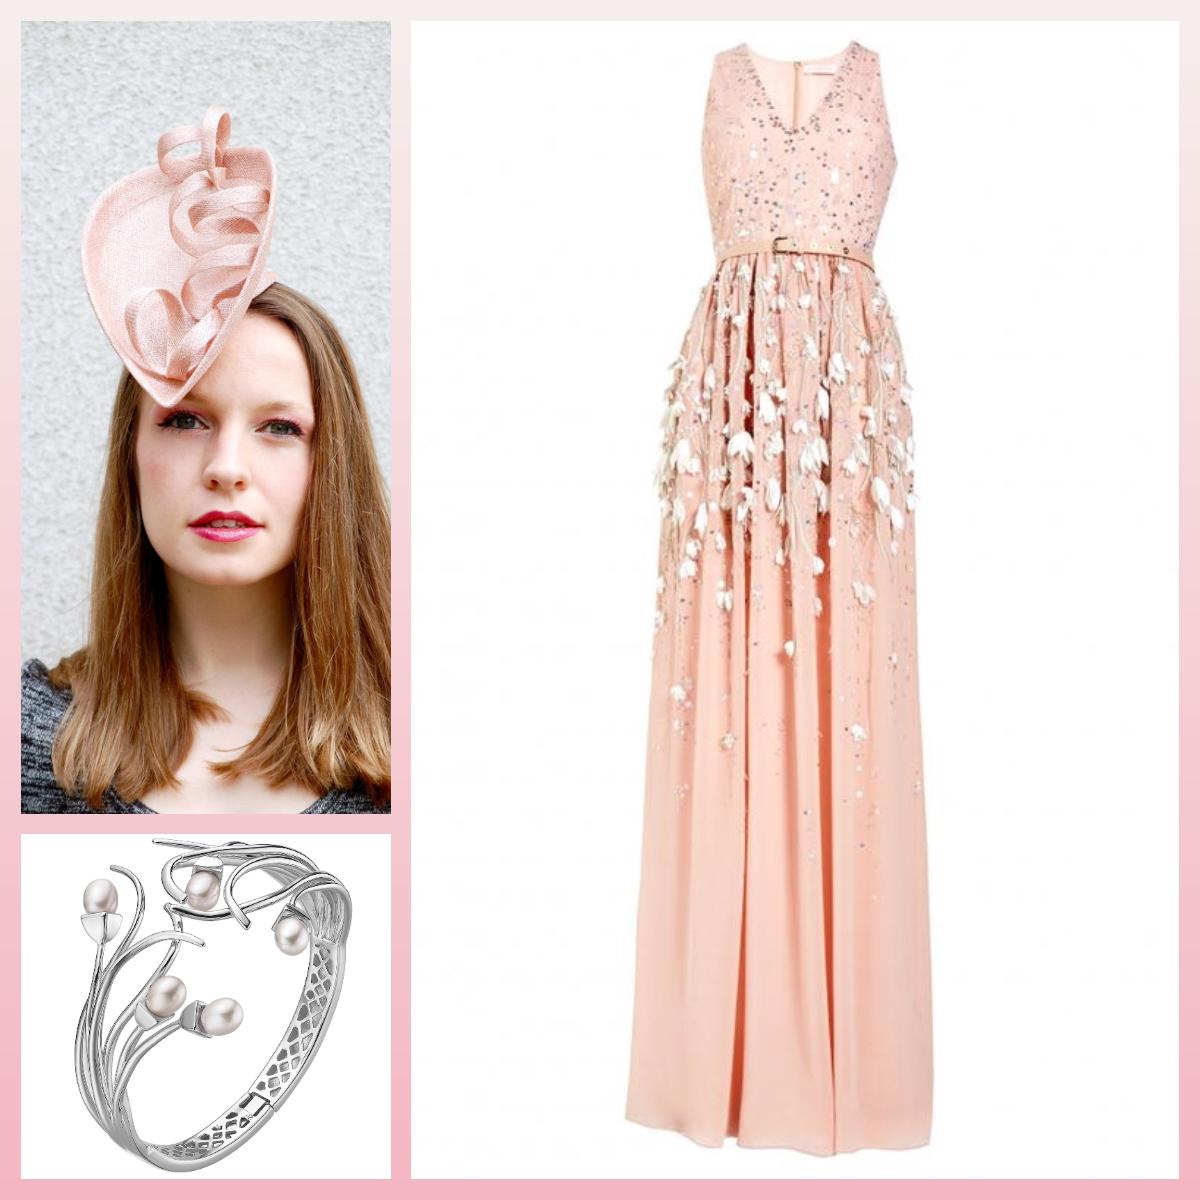 Hat: Aka Tombo Millinery  Dress:Snowdrop Embroidery Evening Gown by Matthew Williamson  Bracelet:Daniel Henderson Jewellers